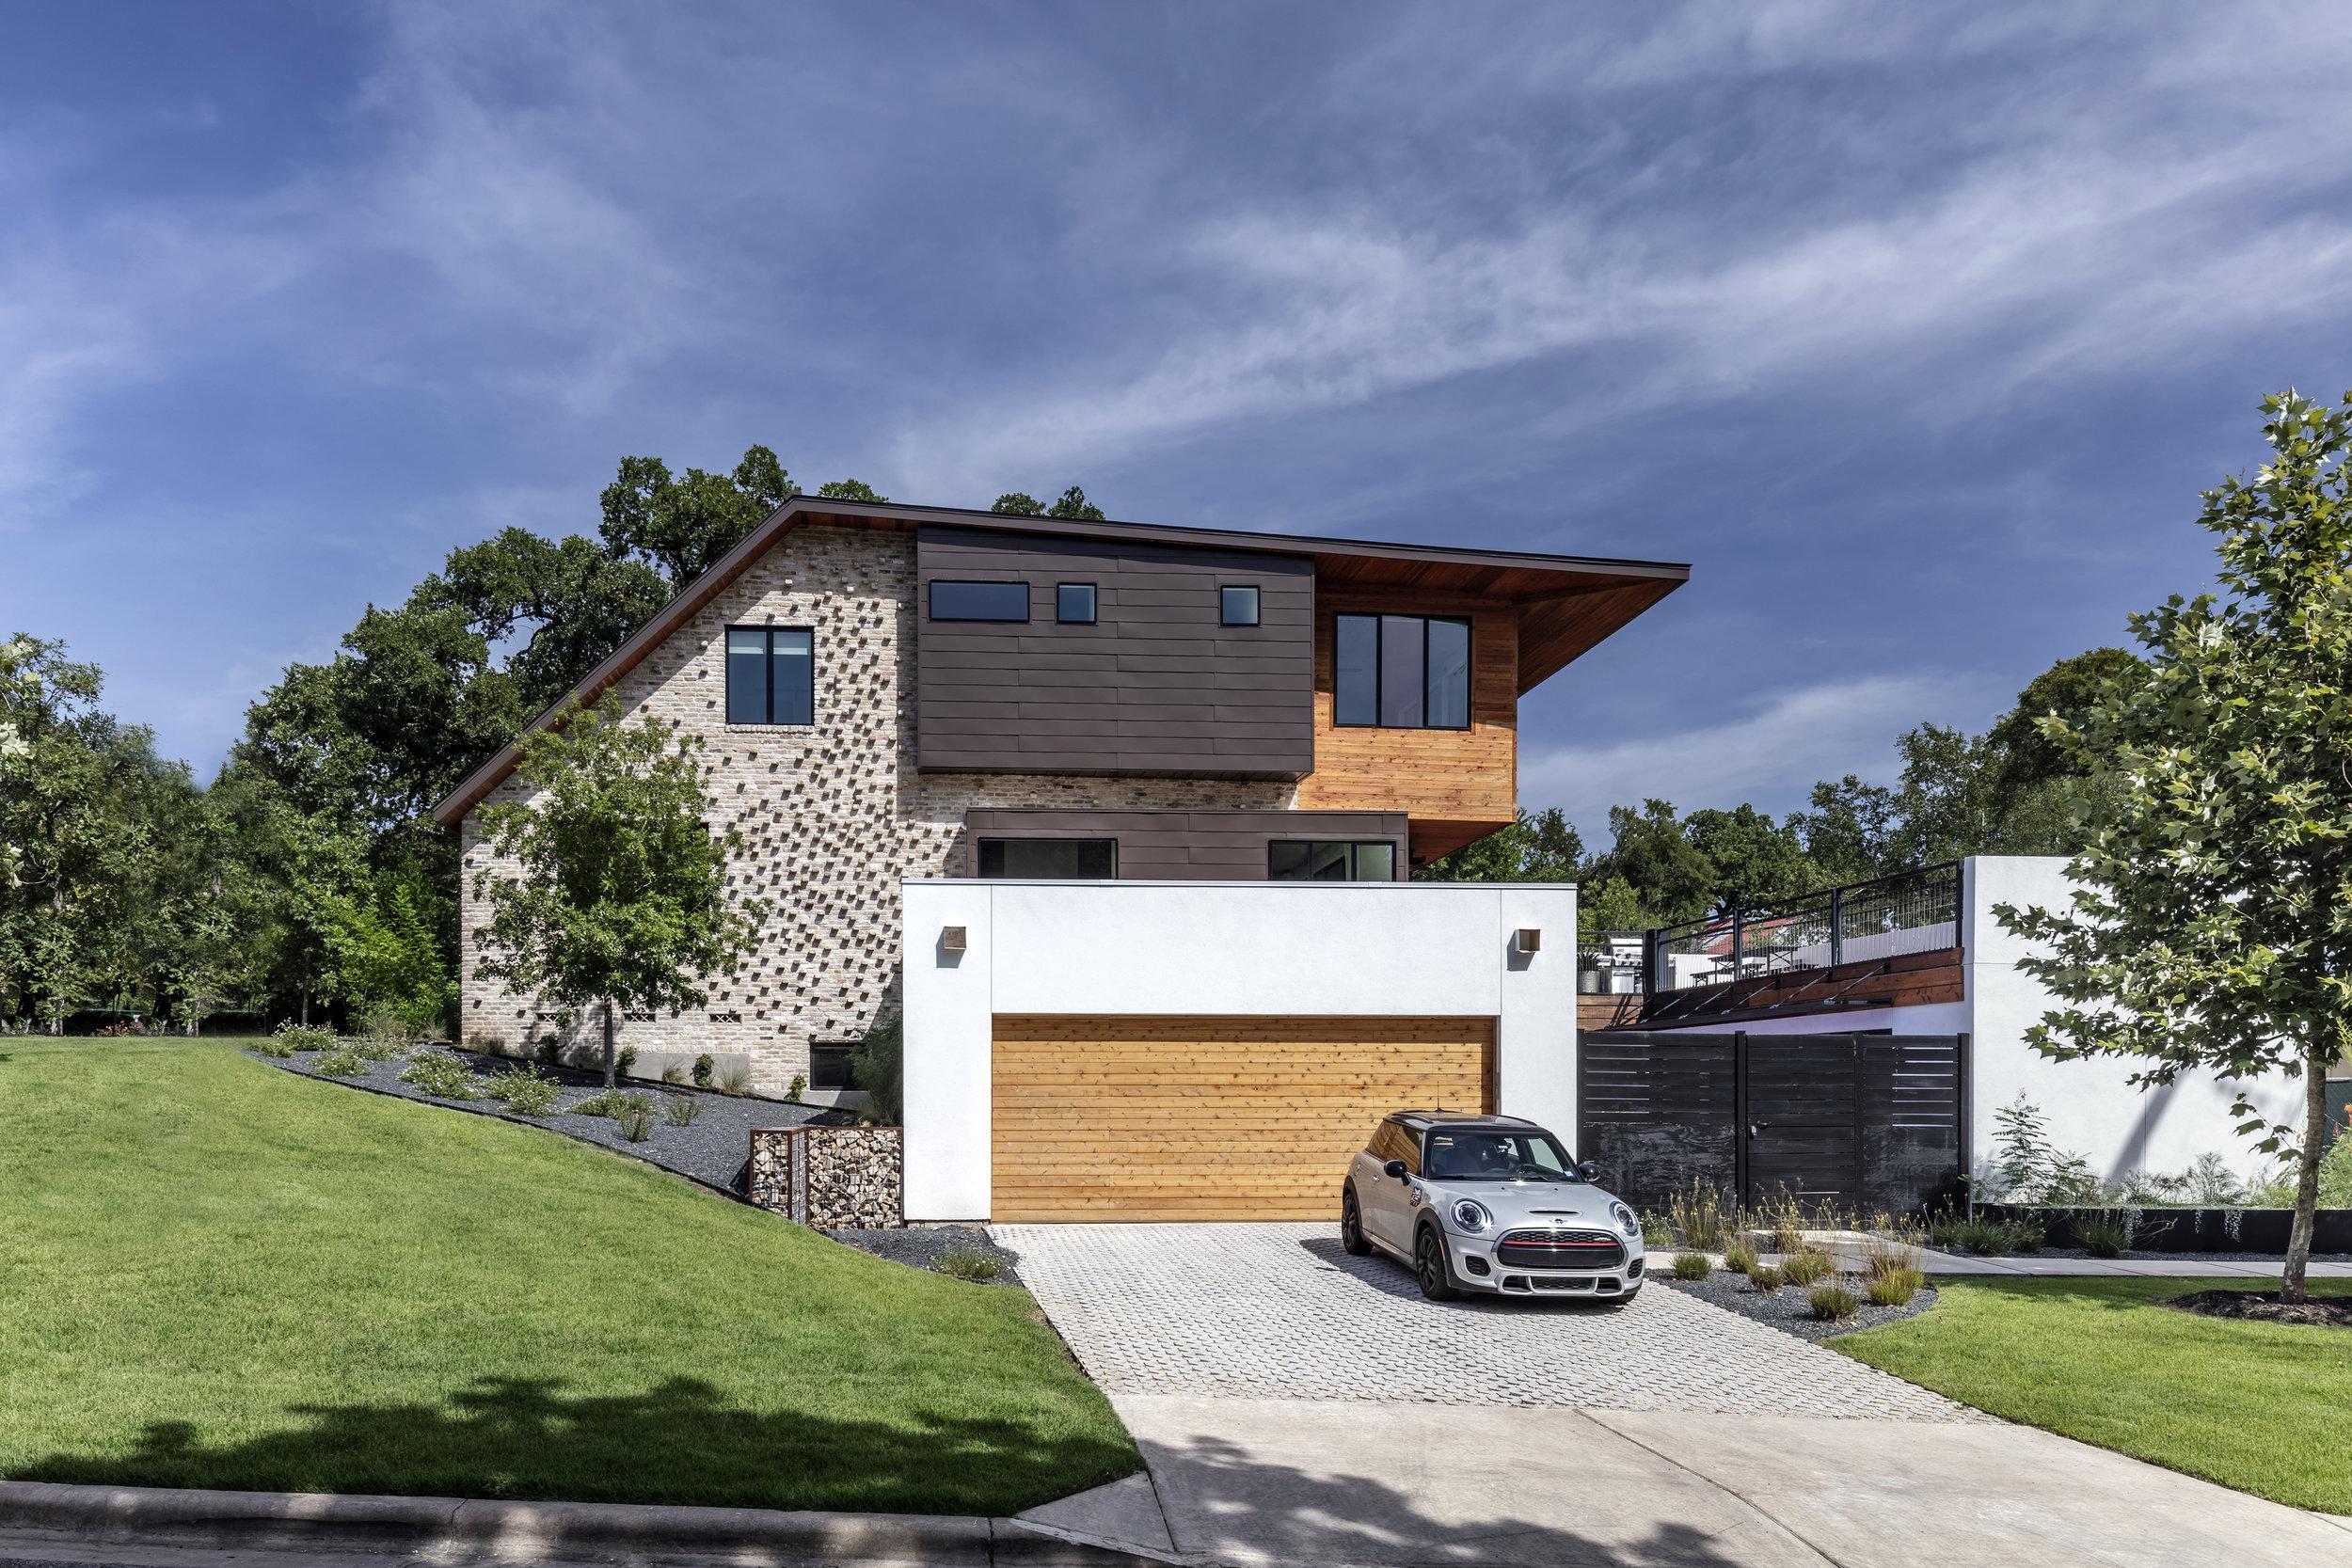 19 Mullet House by Matt Fajkus Architecture. Photo by Charles Davis Smith.jpg